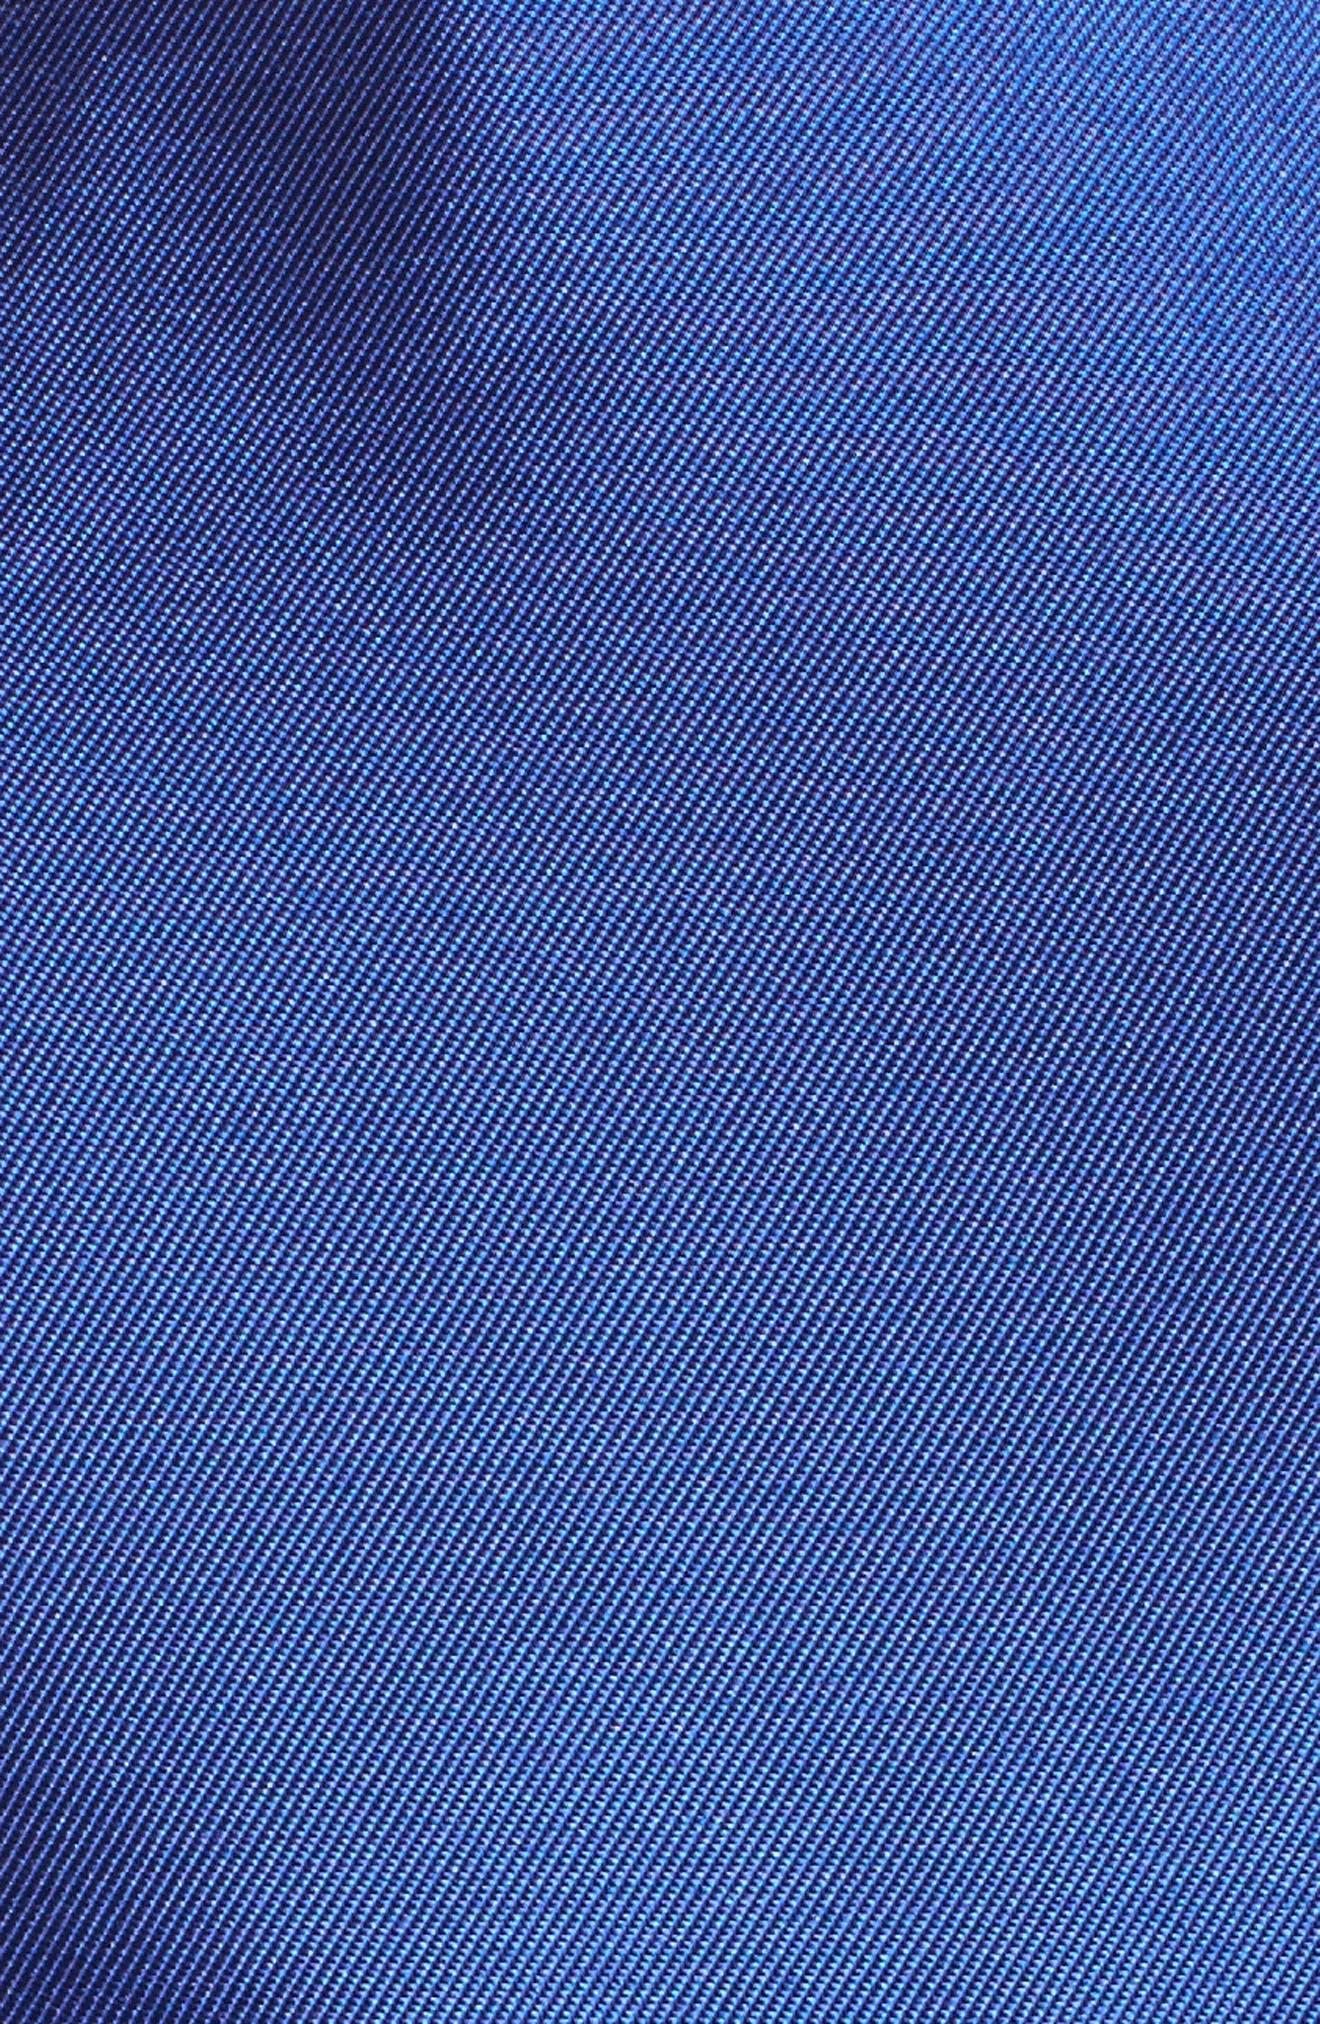 Square Neck Mikado Party Dress,                             Alternate thumbnail 5, color,                             415